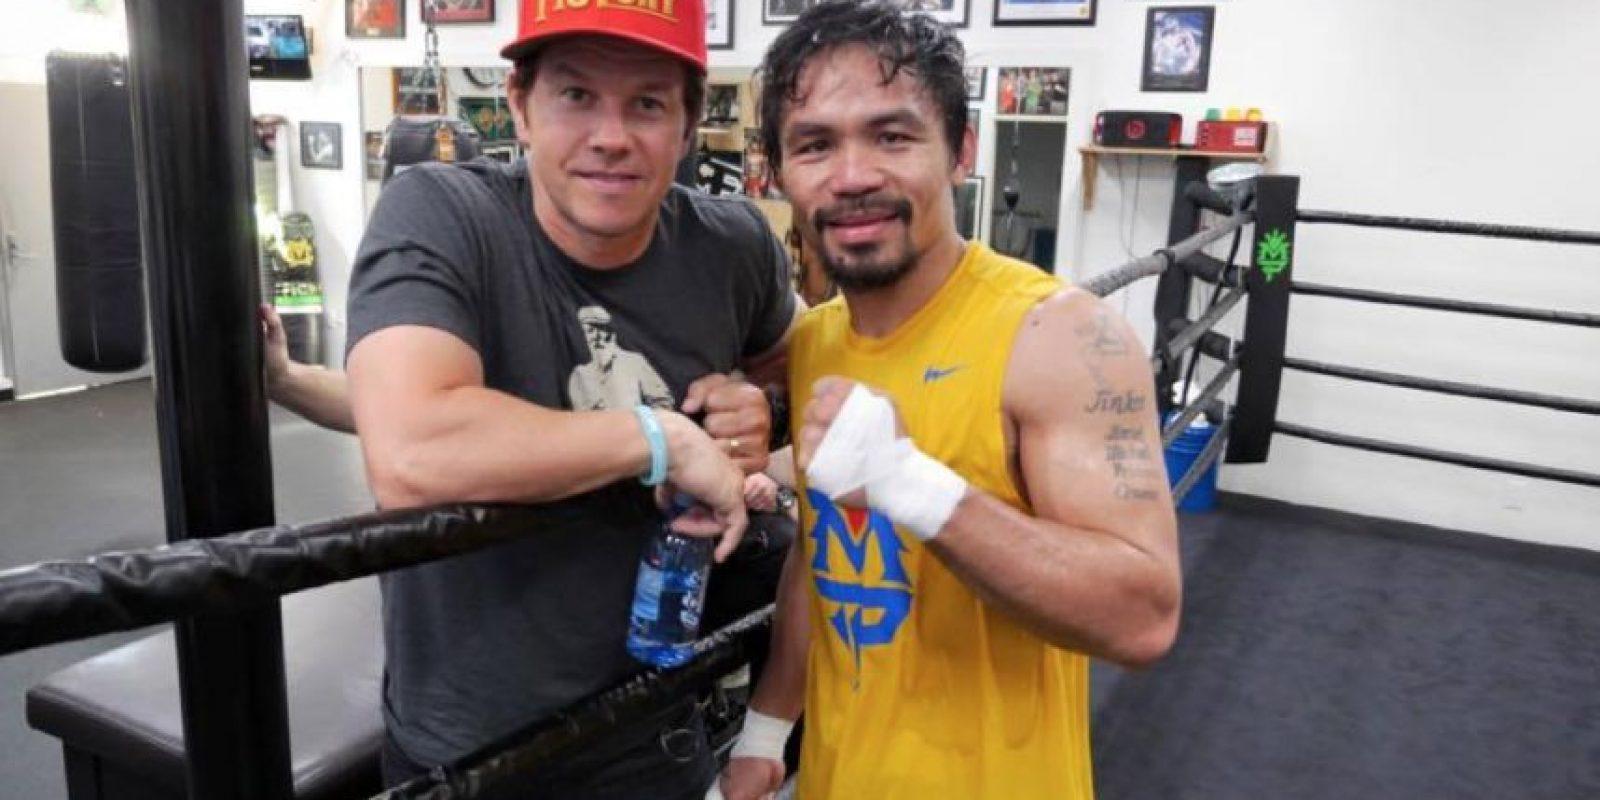 Pacquiao: Mark Wahlberg, cantante, modelo y actor estadounidense. Foto:facebook.com/TopRankMannyPacquiao